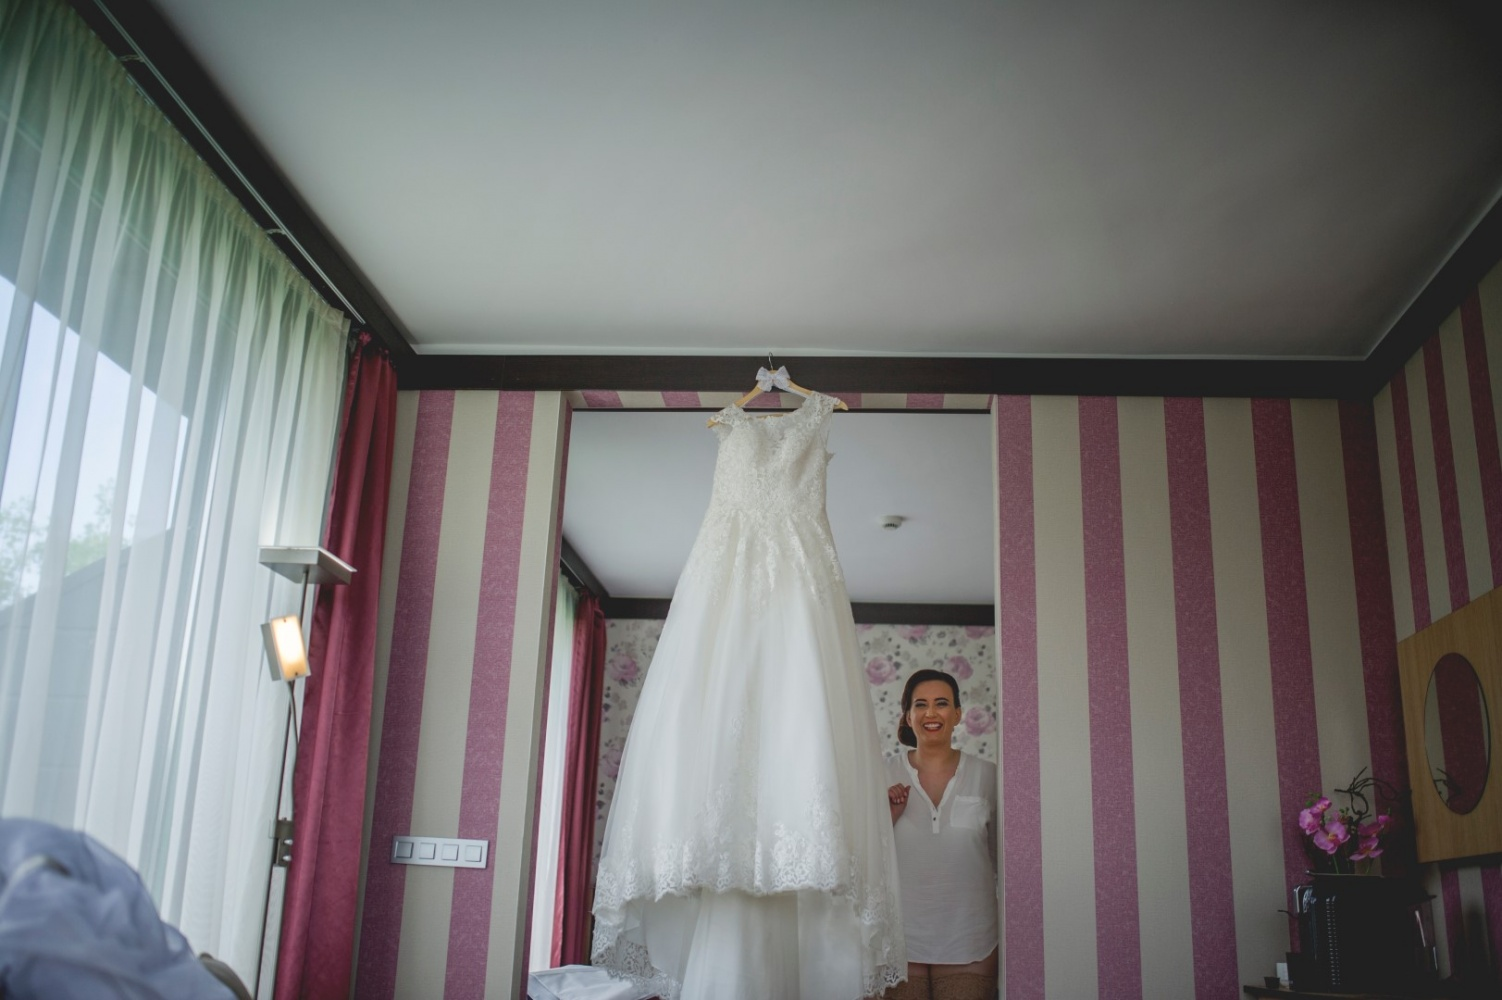 http://www.fotoz.sk/images/gallery-25/normal/fz_148-large.jpg